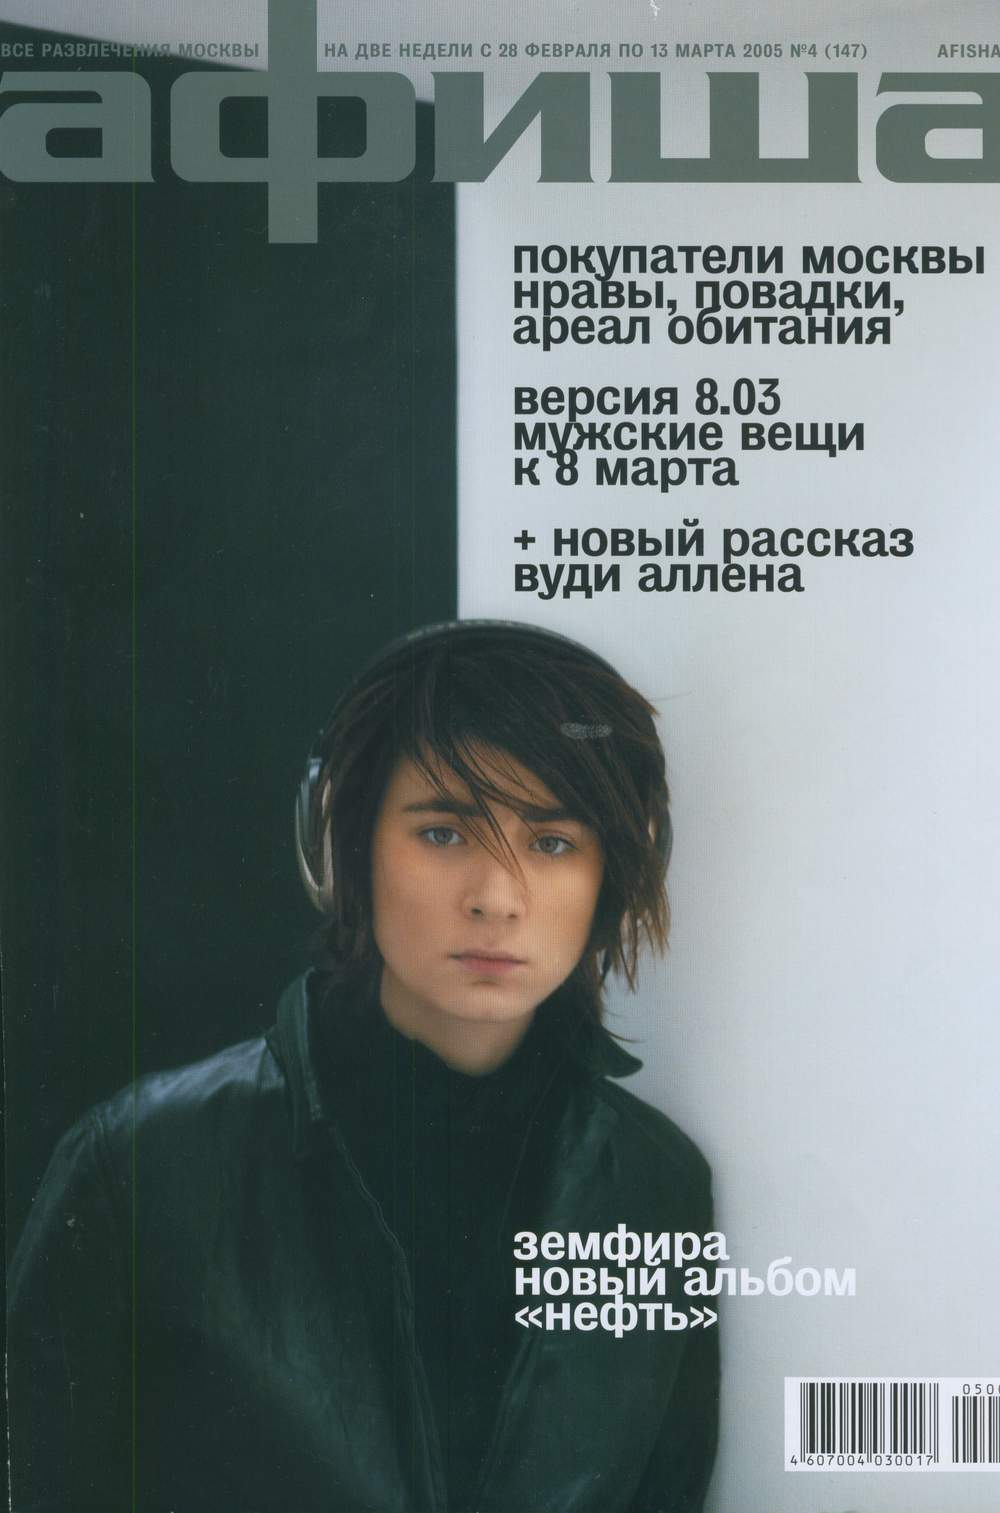 афиша журнал